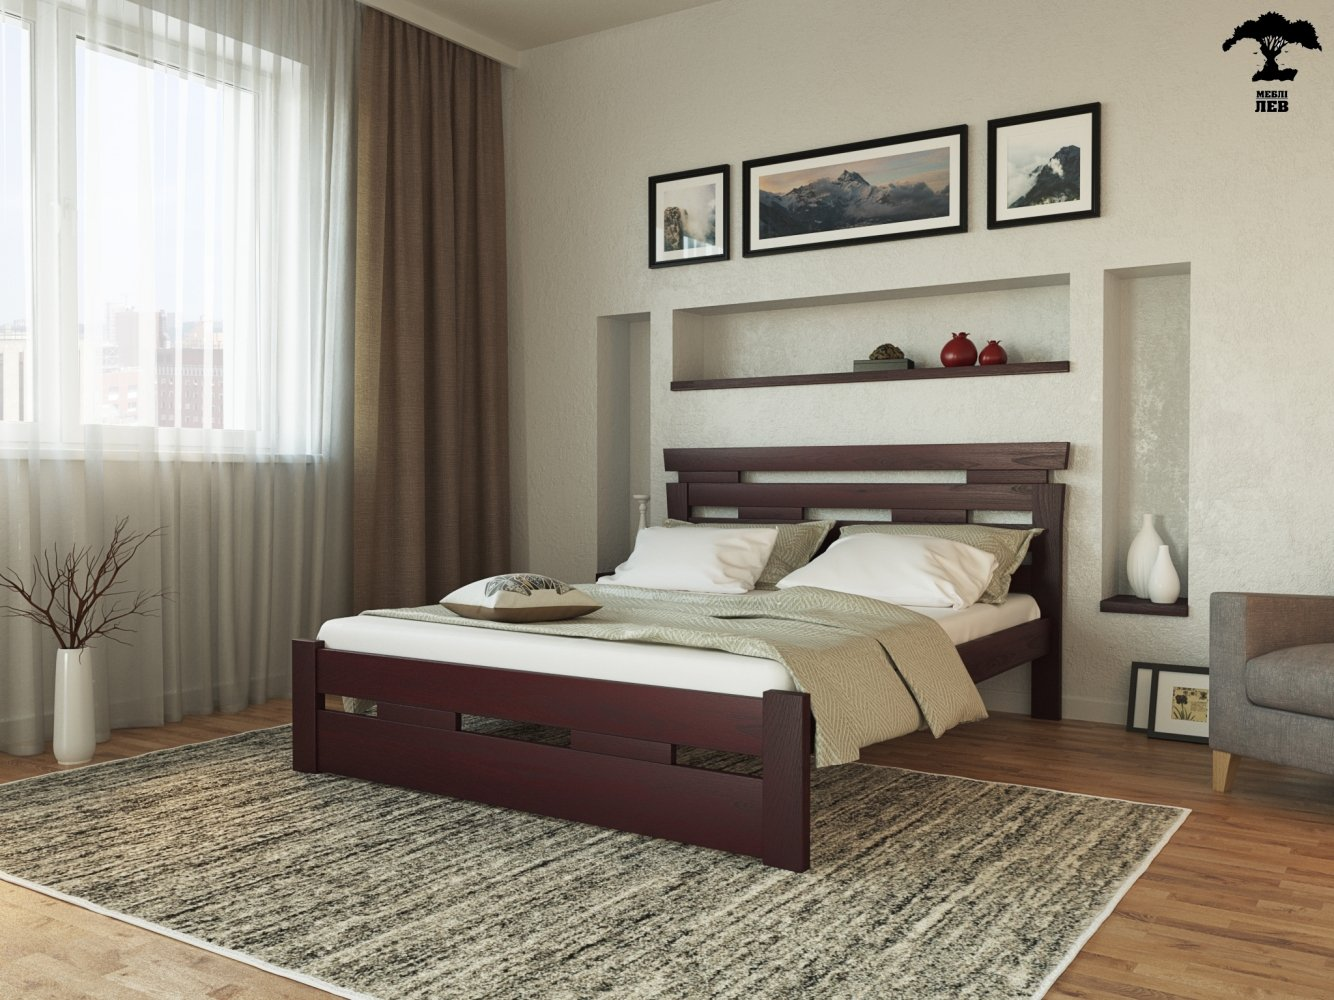 Ліжко Зевс  Лев 6